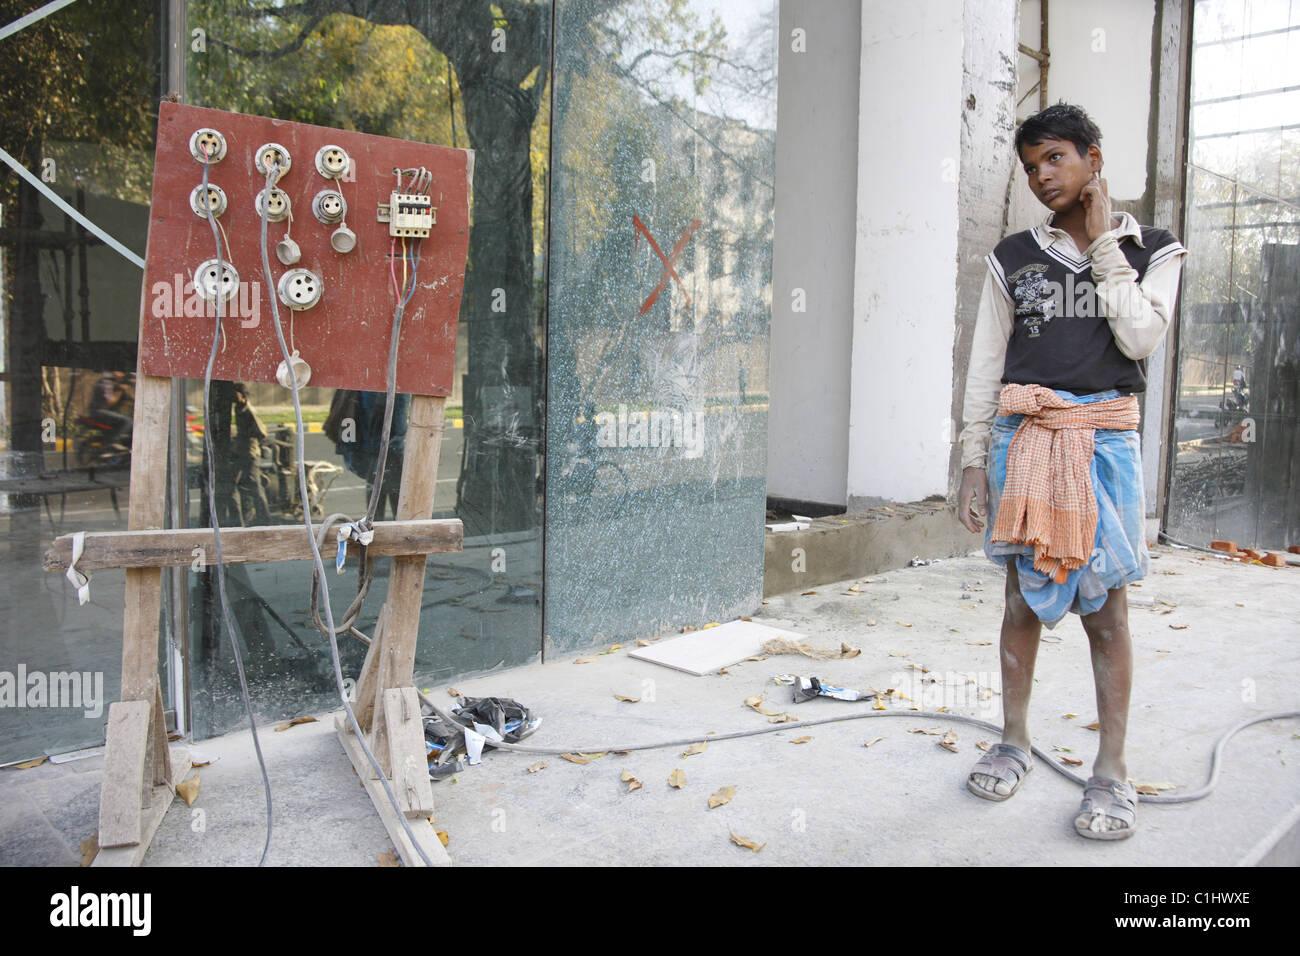 IND, l'Inde, 20110310, l'homme à l'alimentation du site Photo Stock